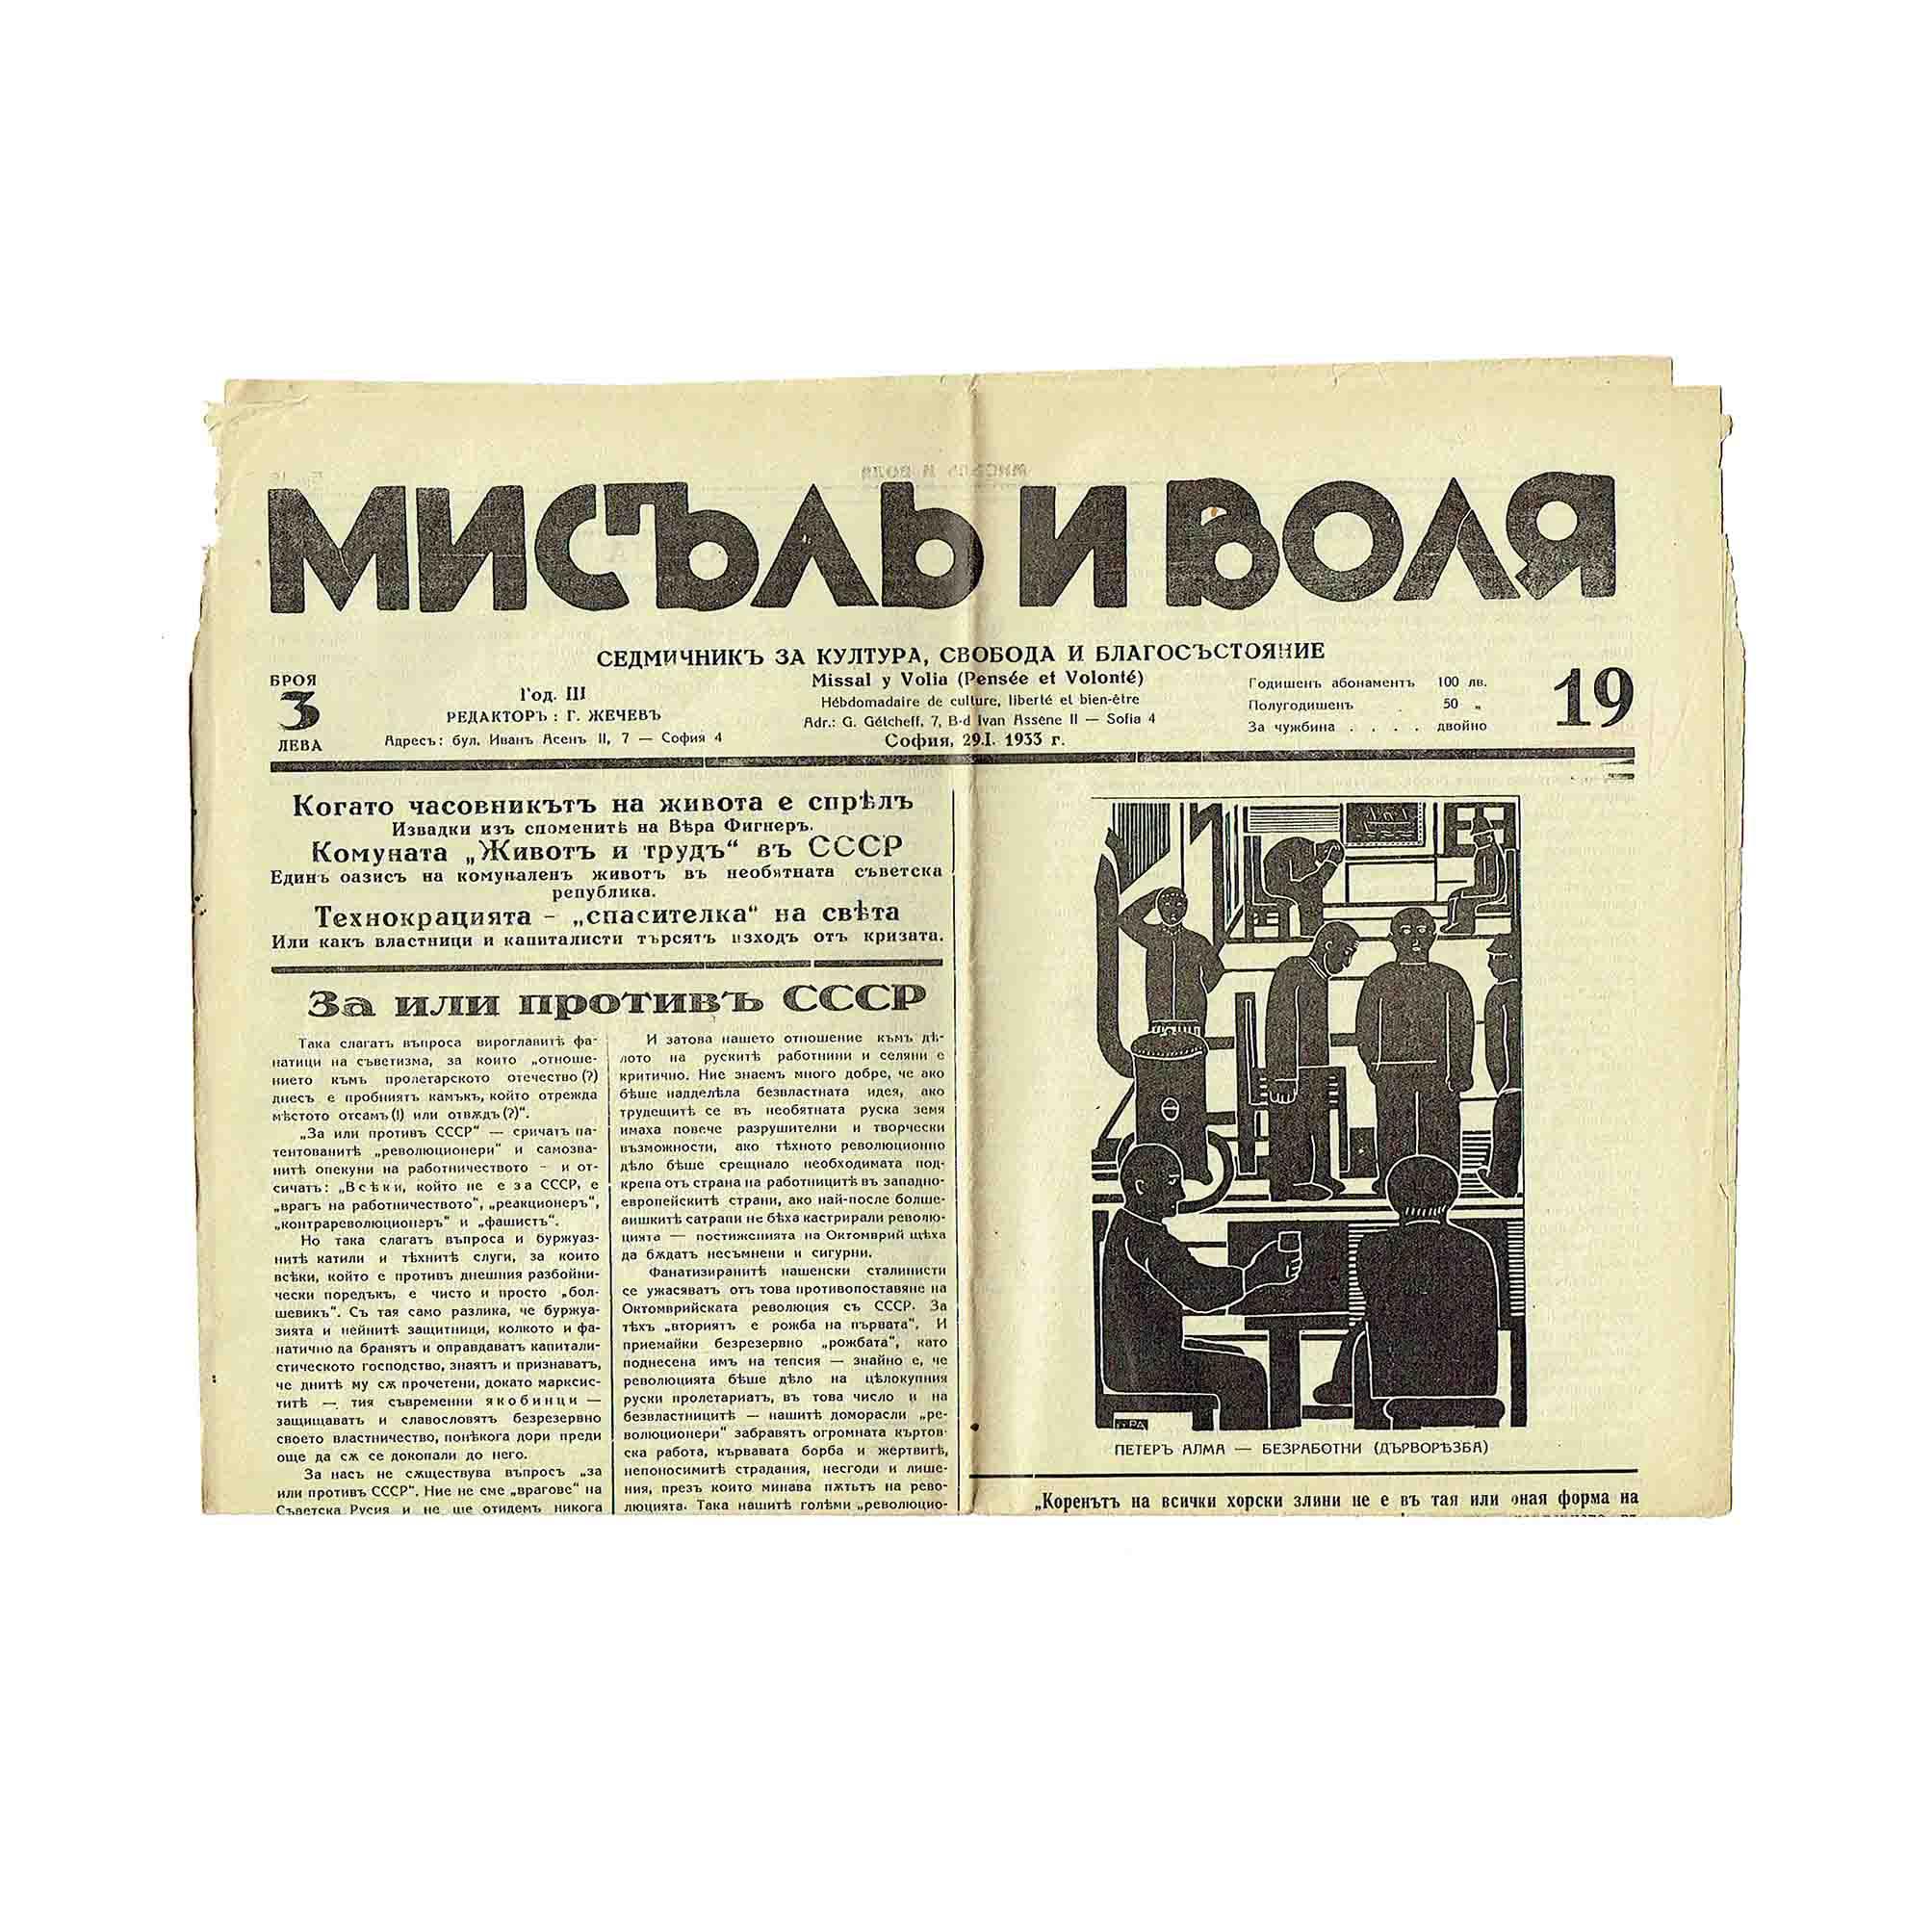 5847 Misal i Volya Gedanke und Wille III 19 1930 Peter Alma Titelblatt frei N